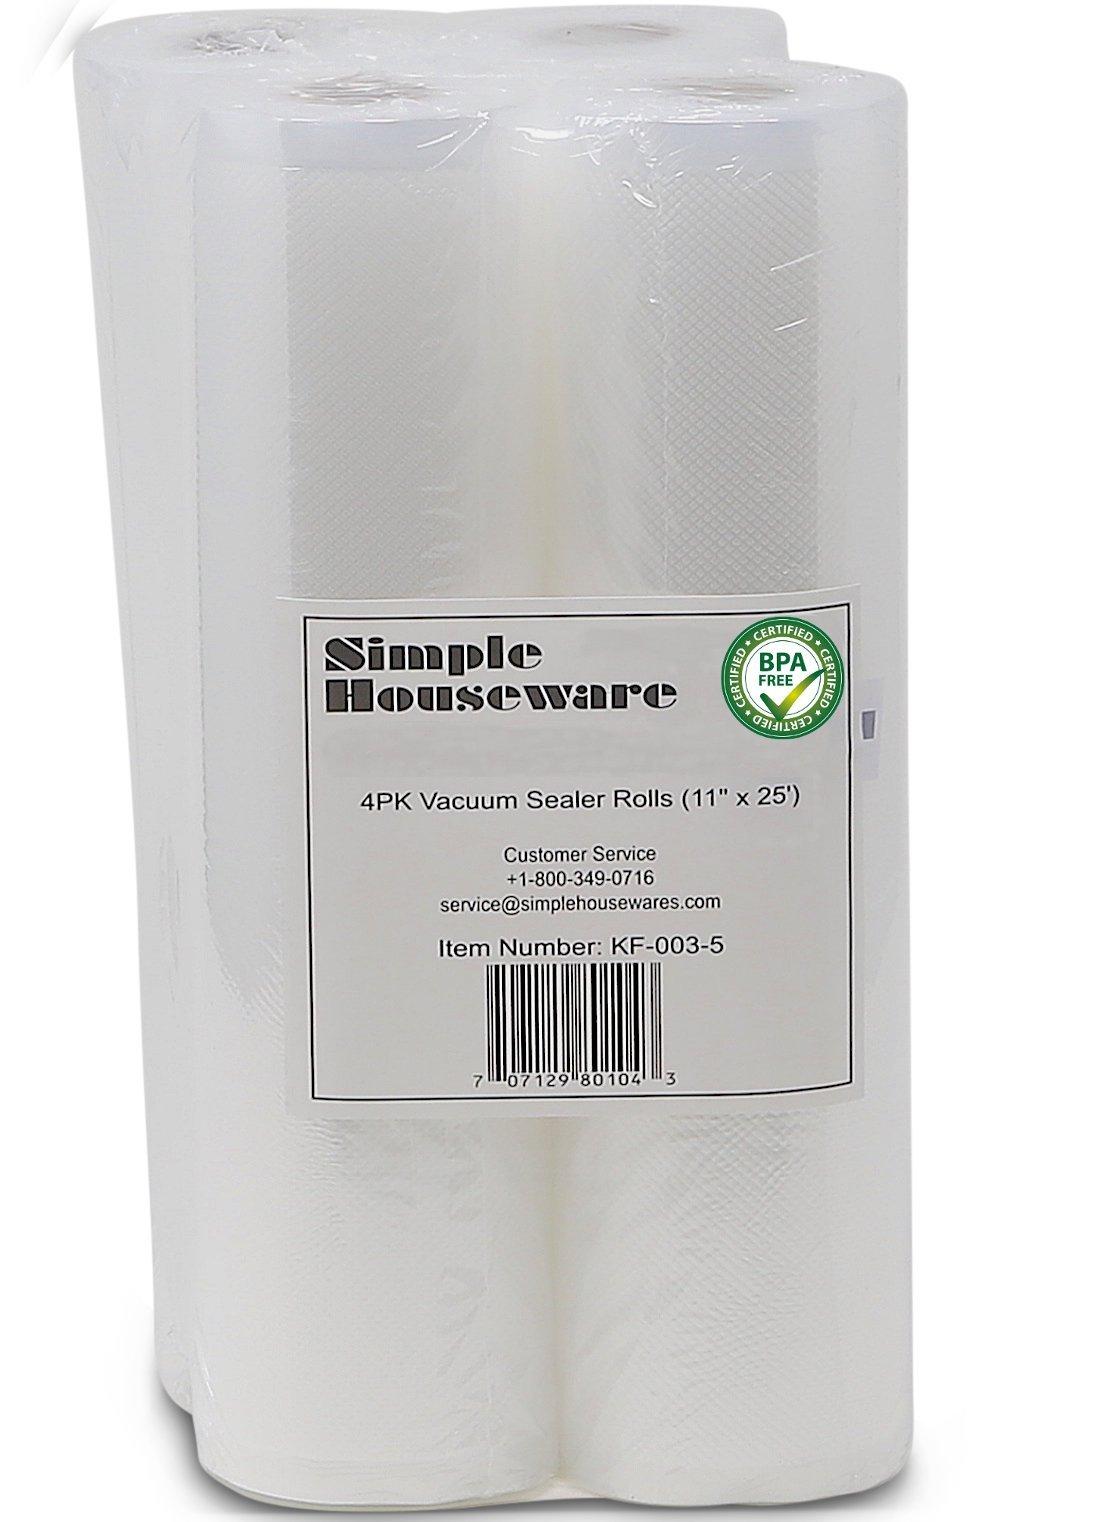 4 Pack - SimpleHouseware 11'' x 25' Commercial Vacuum Sealer Rolls Food Storage Saver Compatible to Foodsaver Sous Vide (total 100 feet)